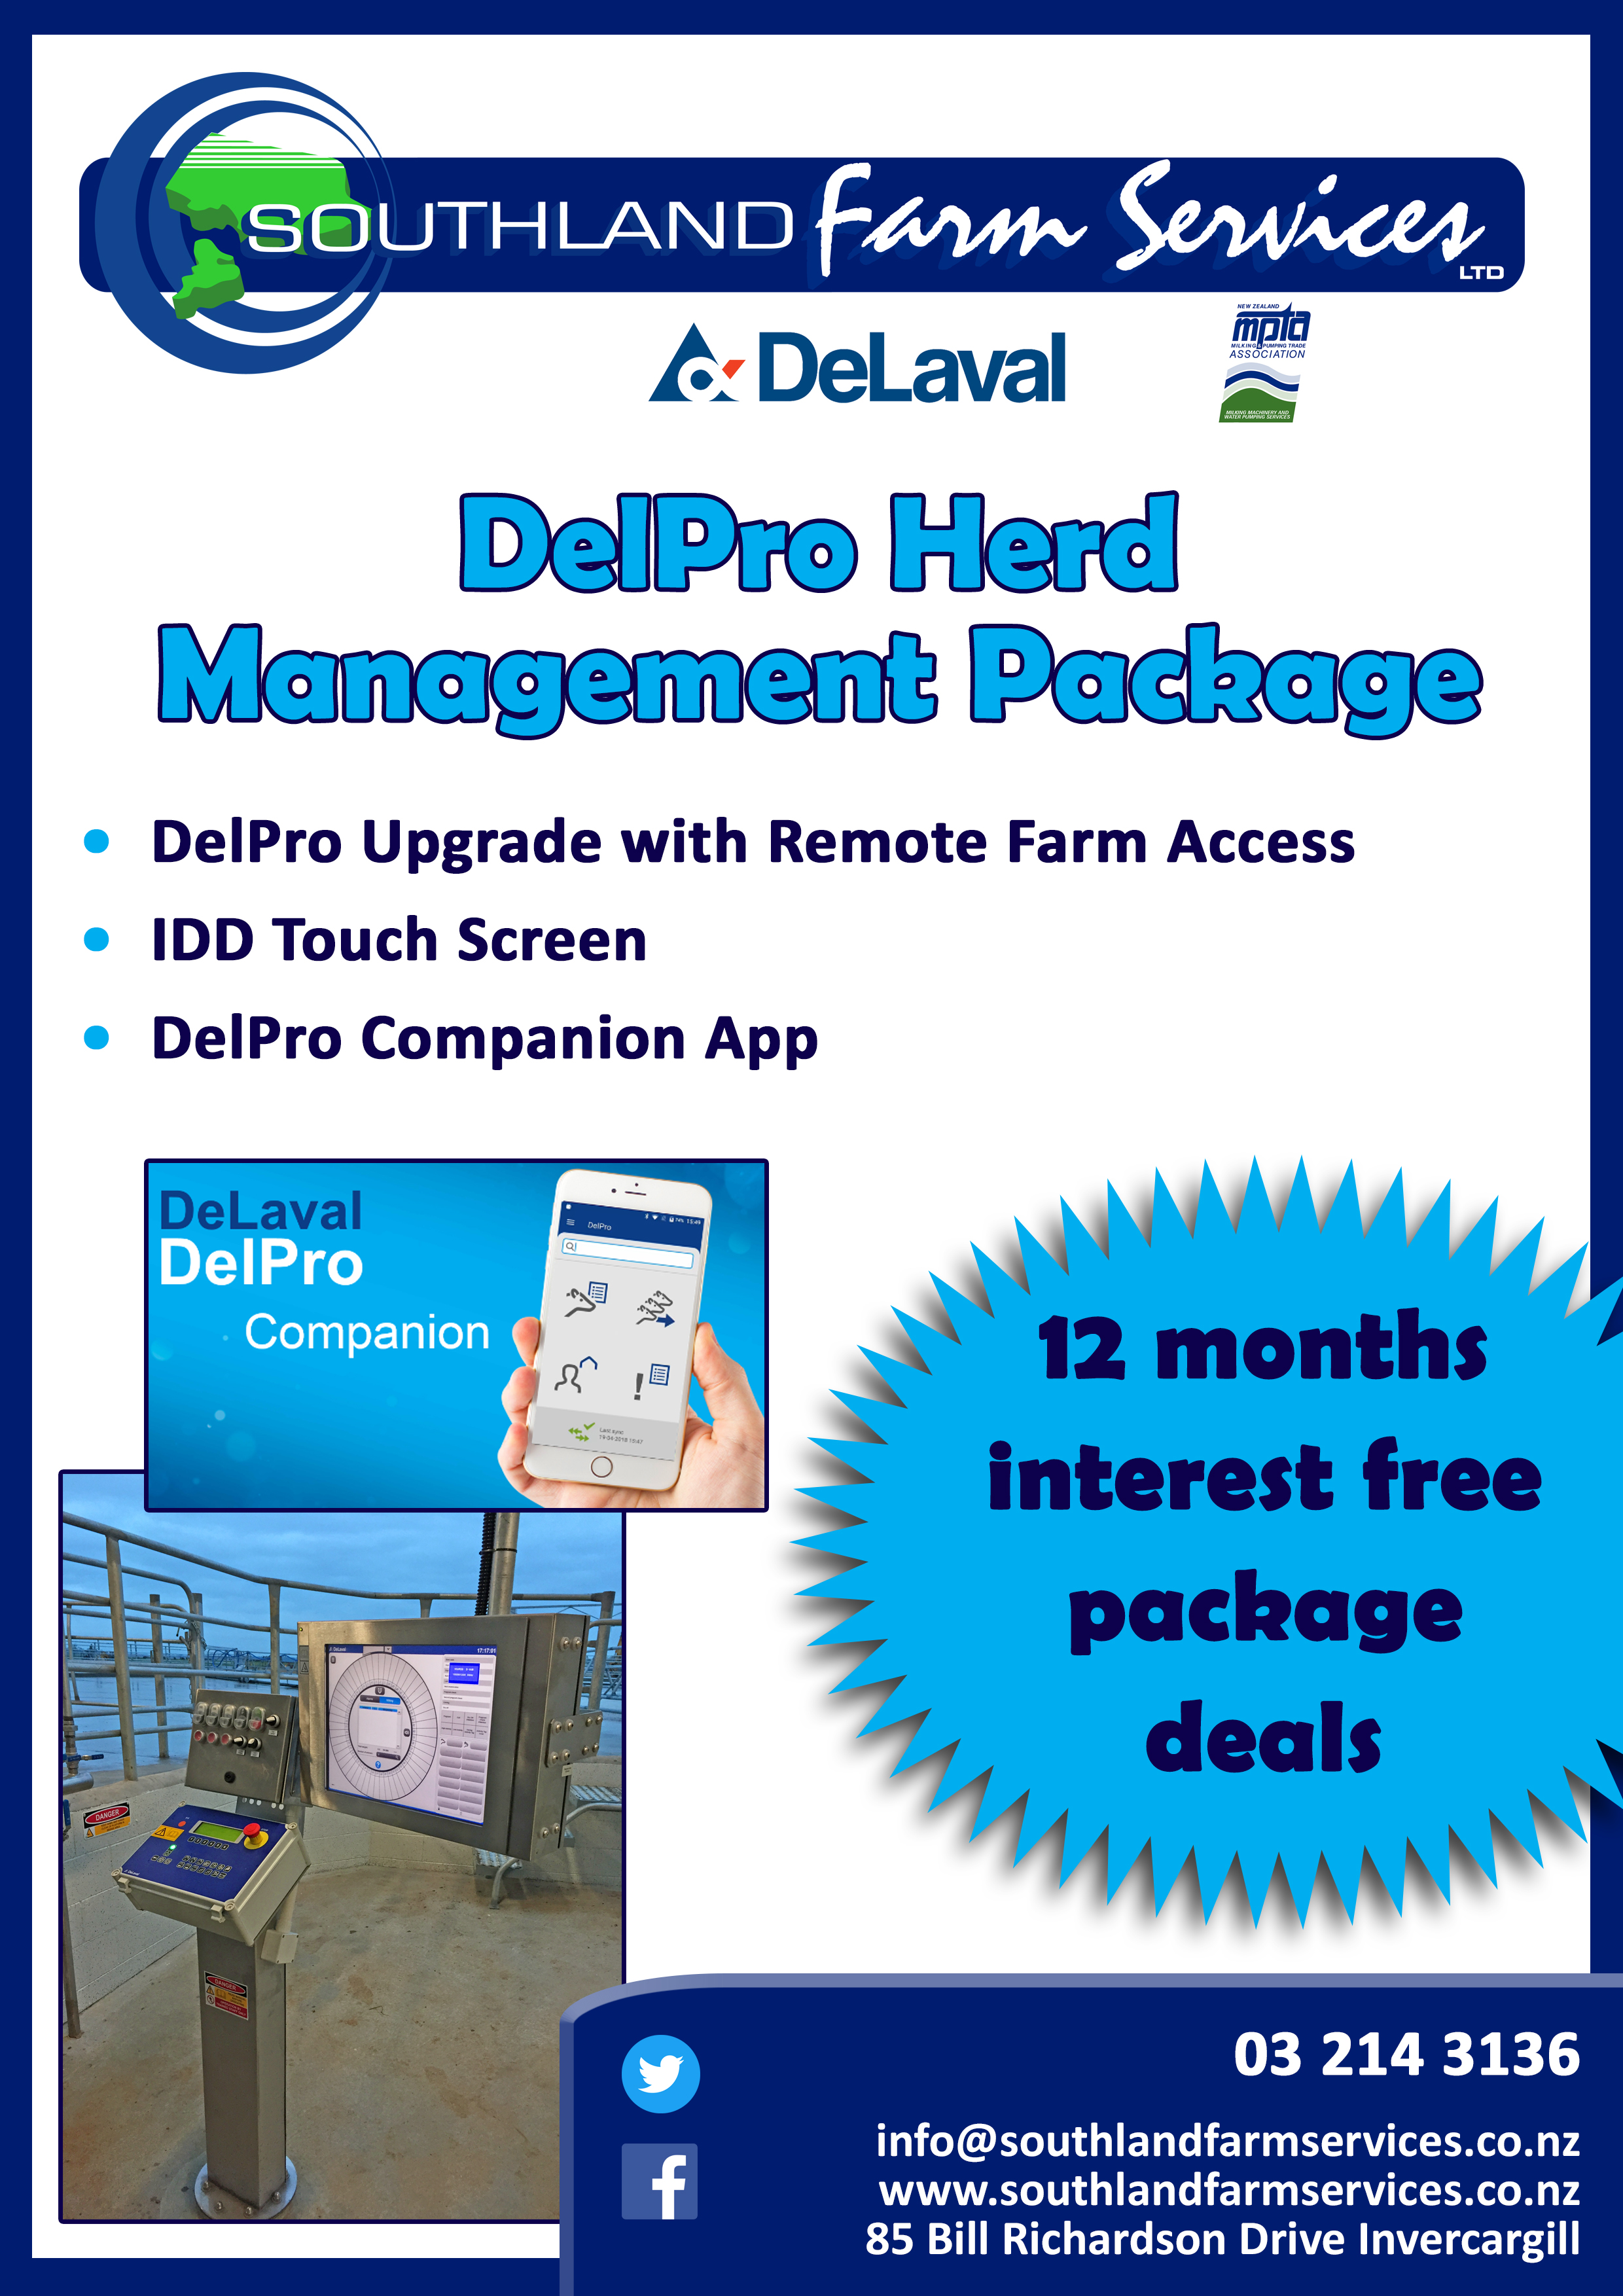 Delpro info.jpg